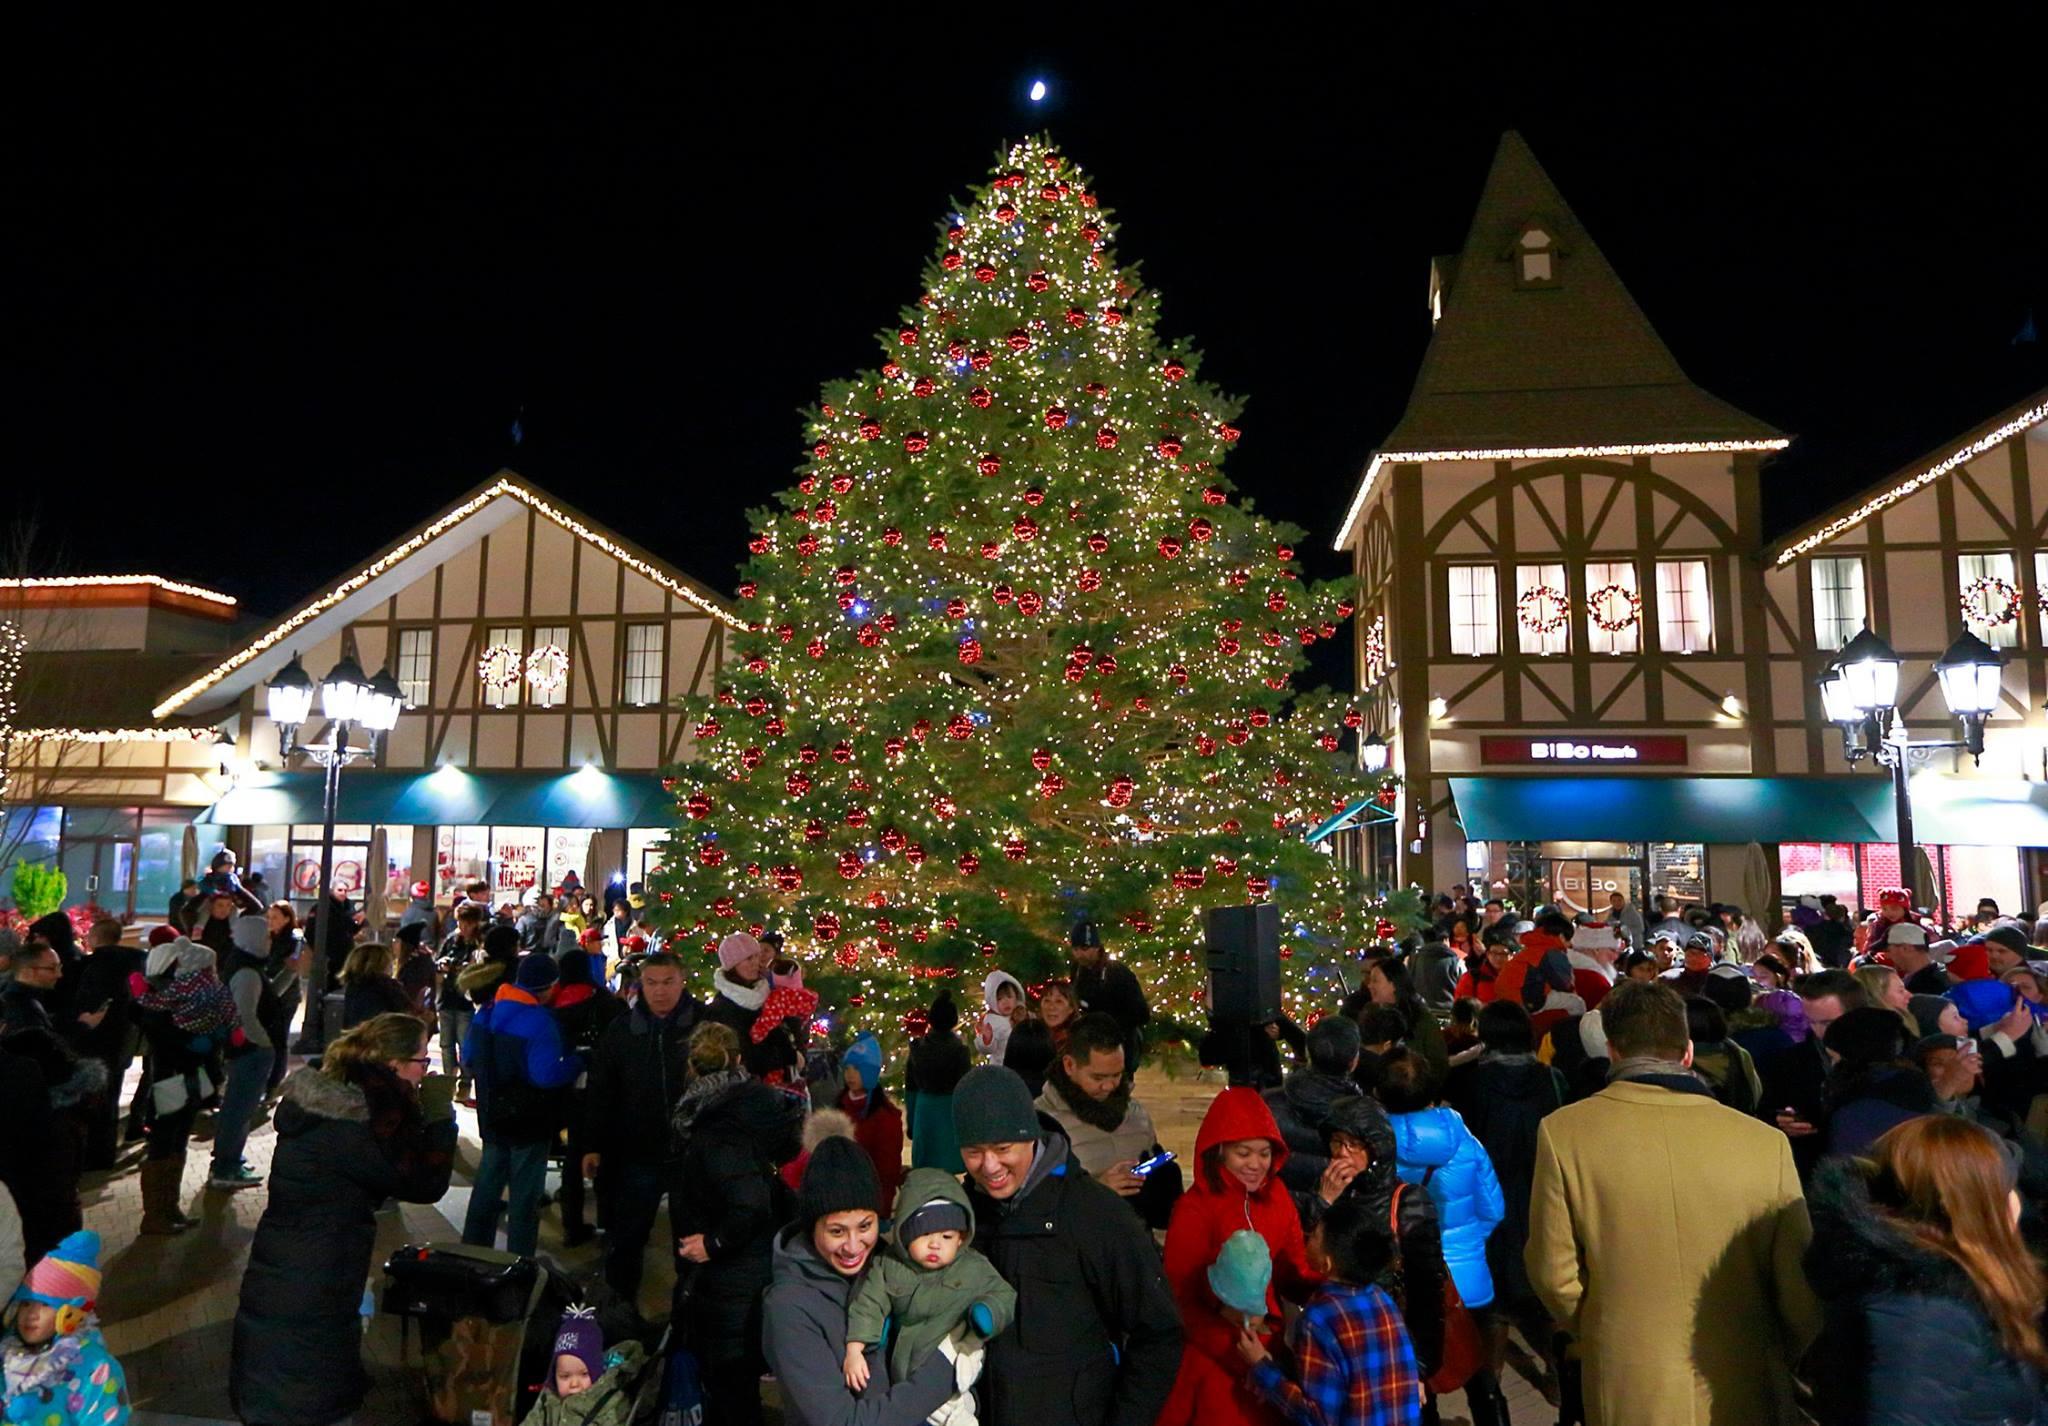 See A 45 Ft. Christmas Tree & 25,000 Lights Shine At